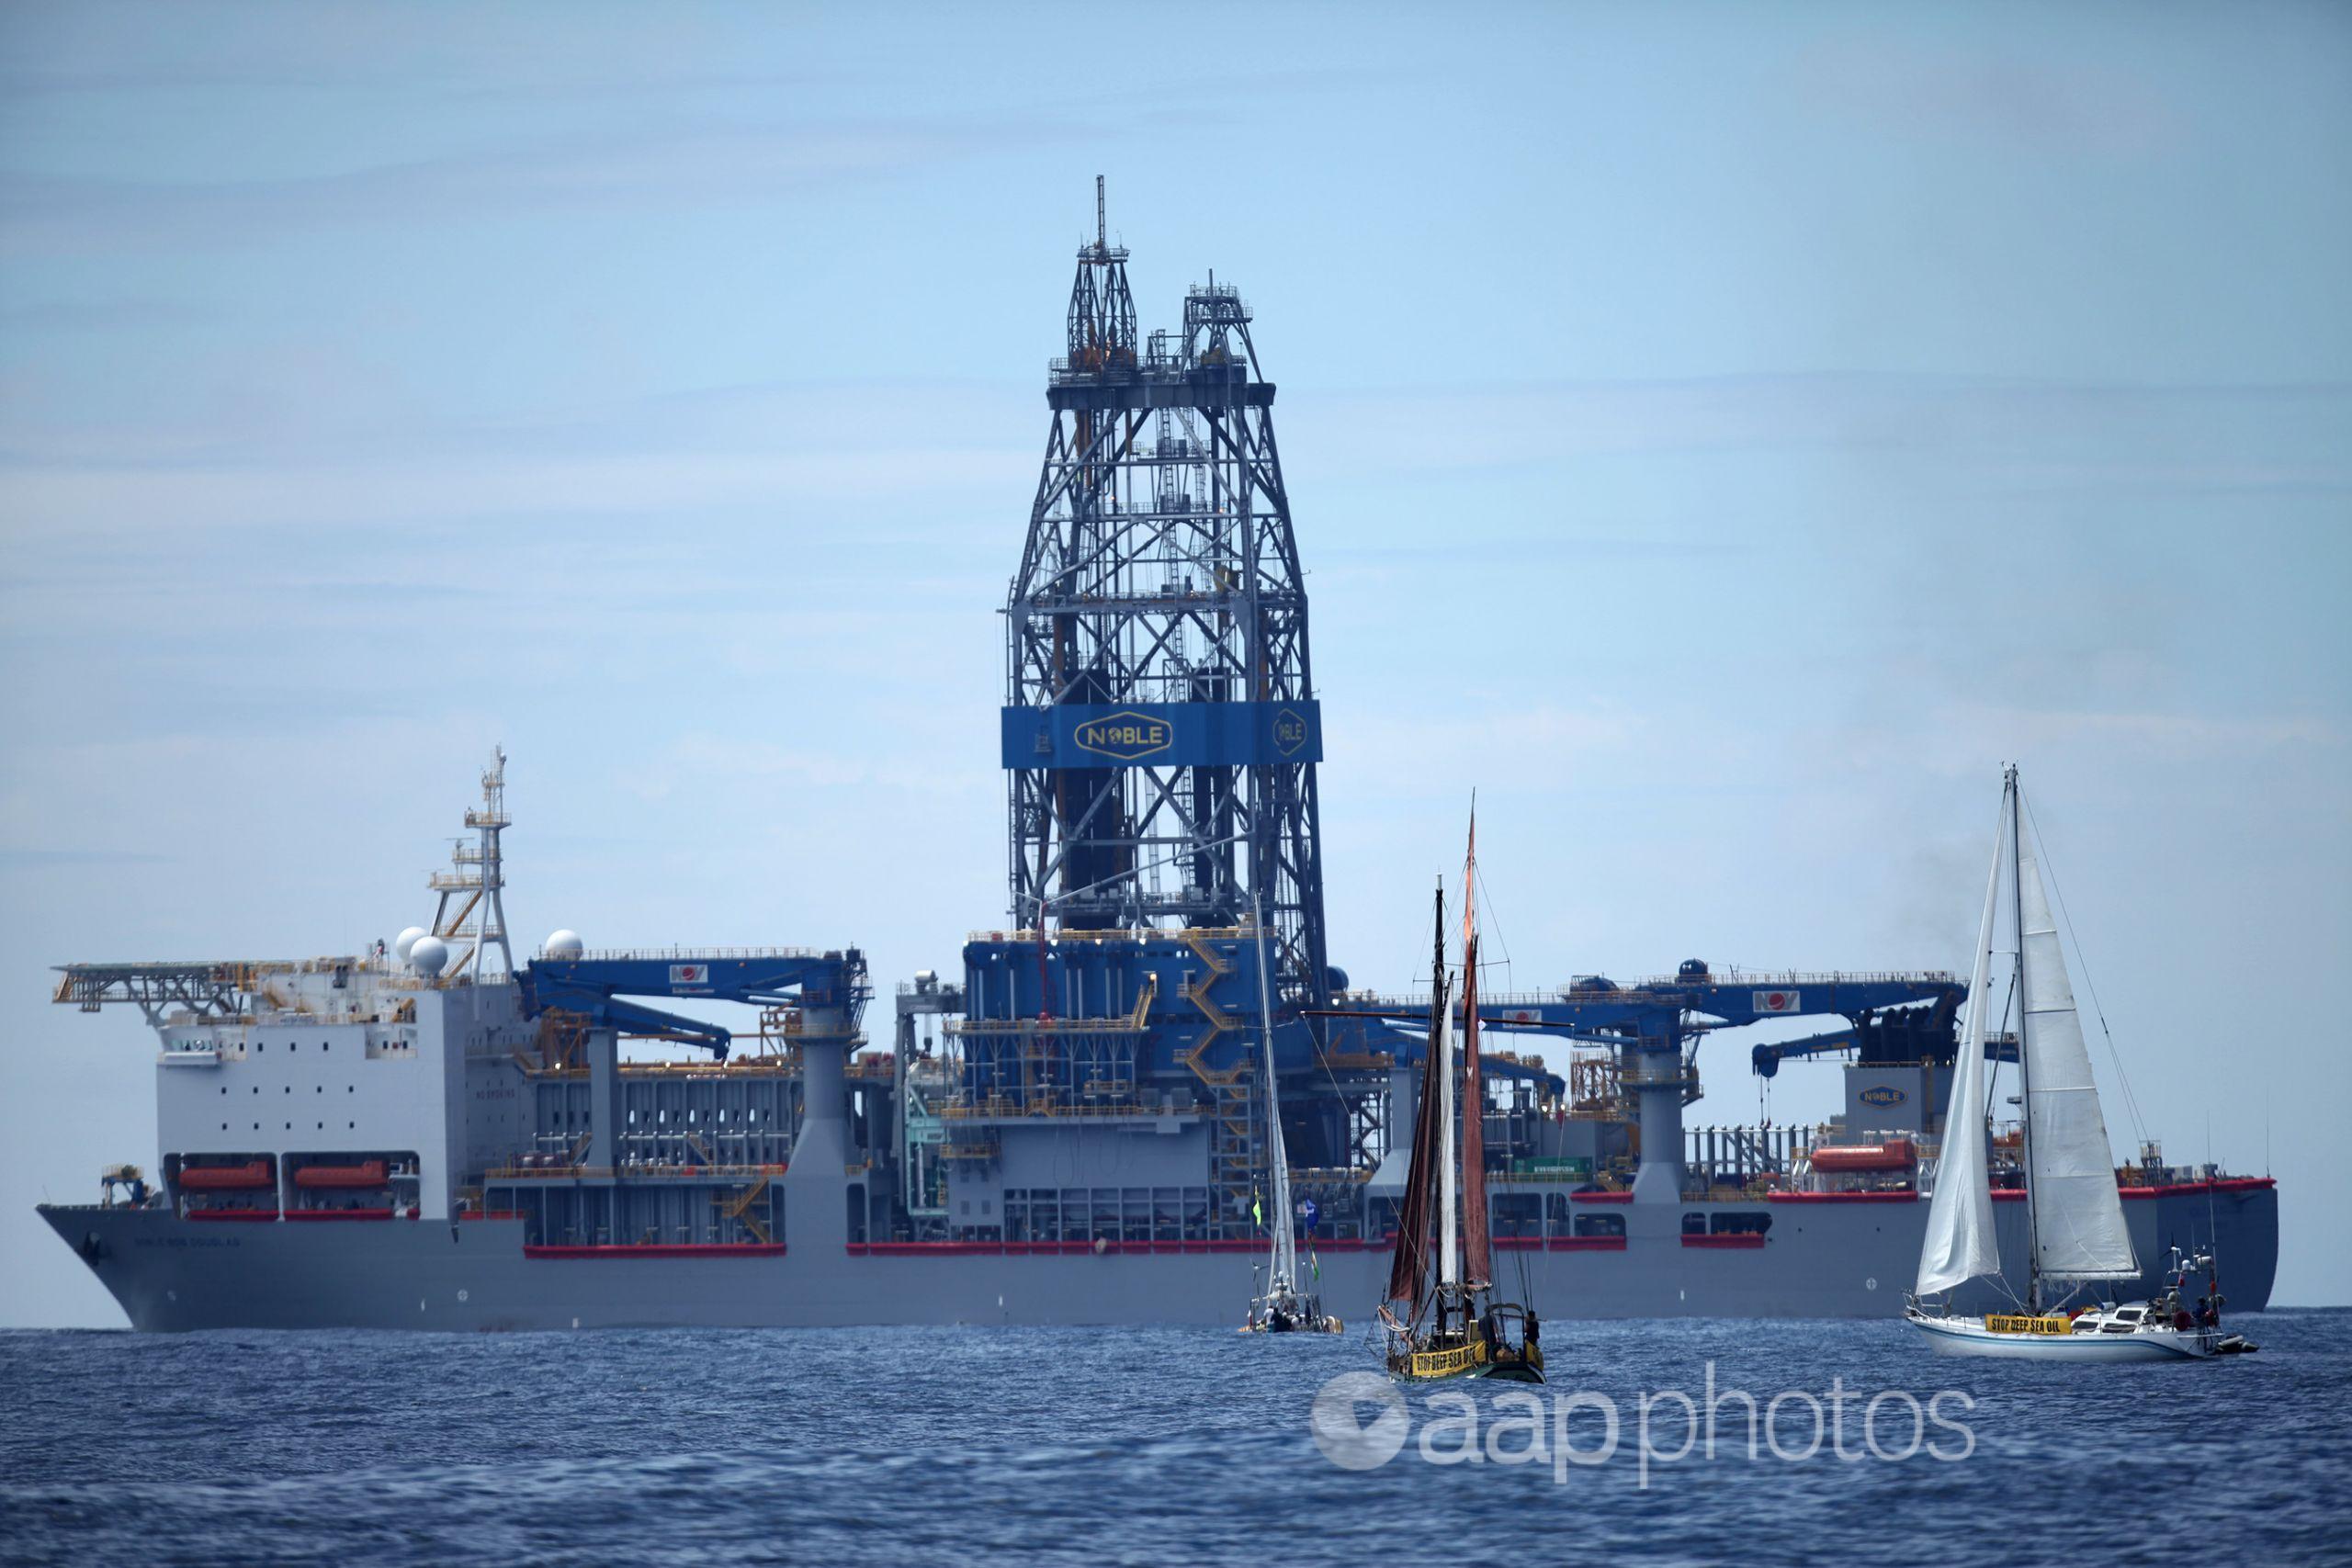 Protest yachts confront the Noble Bob Douglas drilling ship